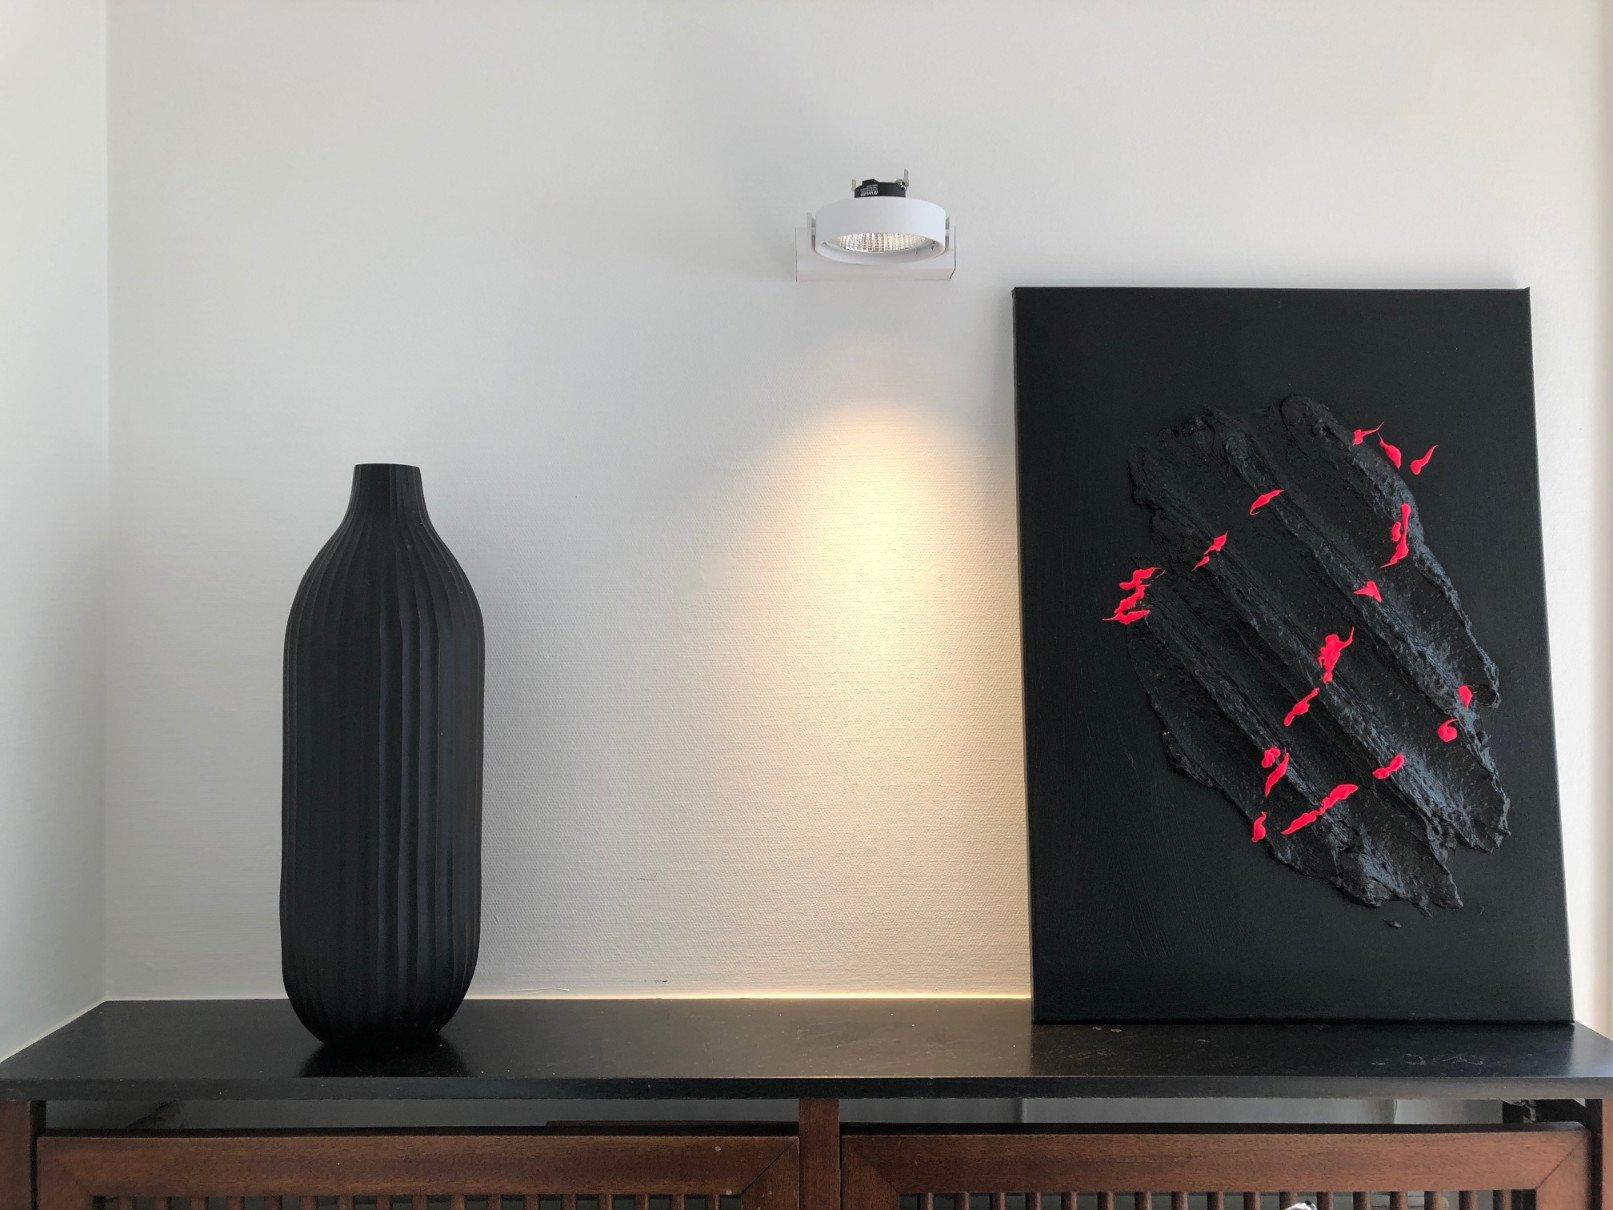 Rietveldprojects-Villa Were Di - Te Koop : Te Huur (per week)10